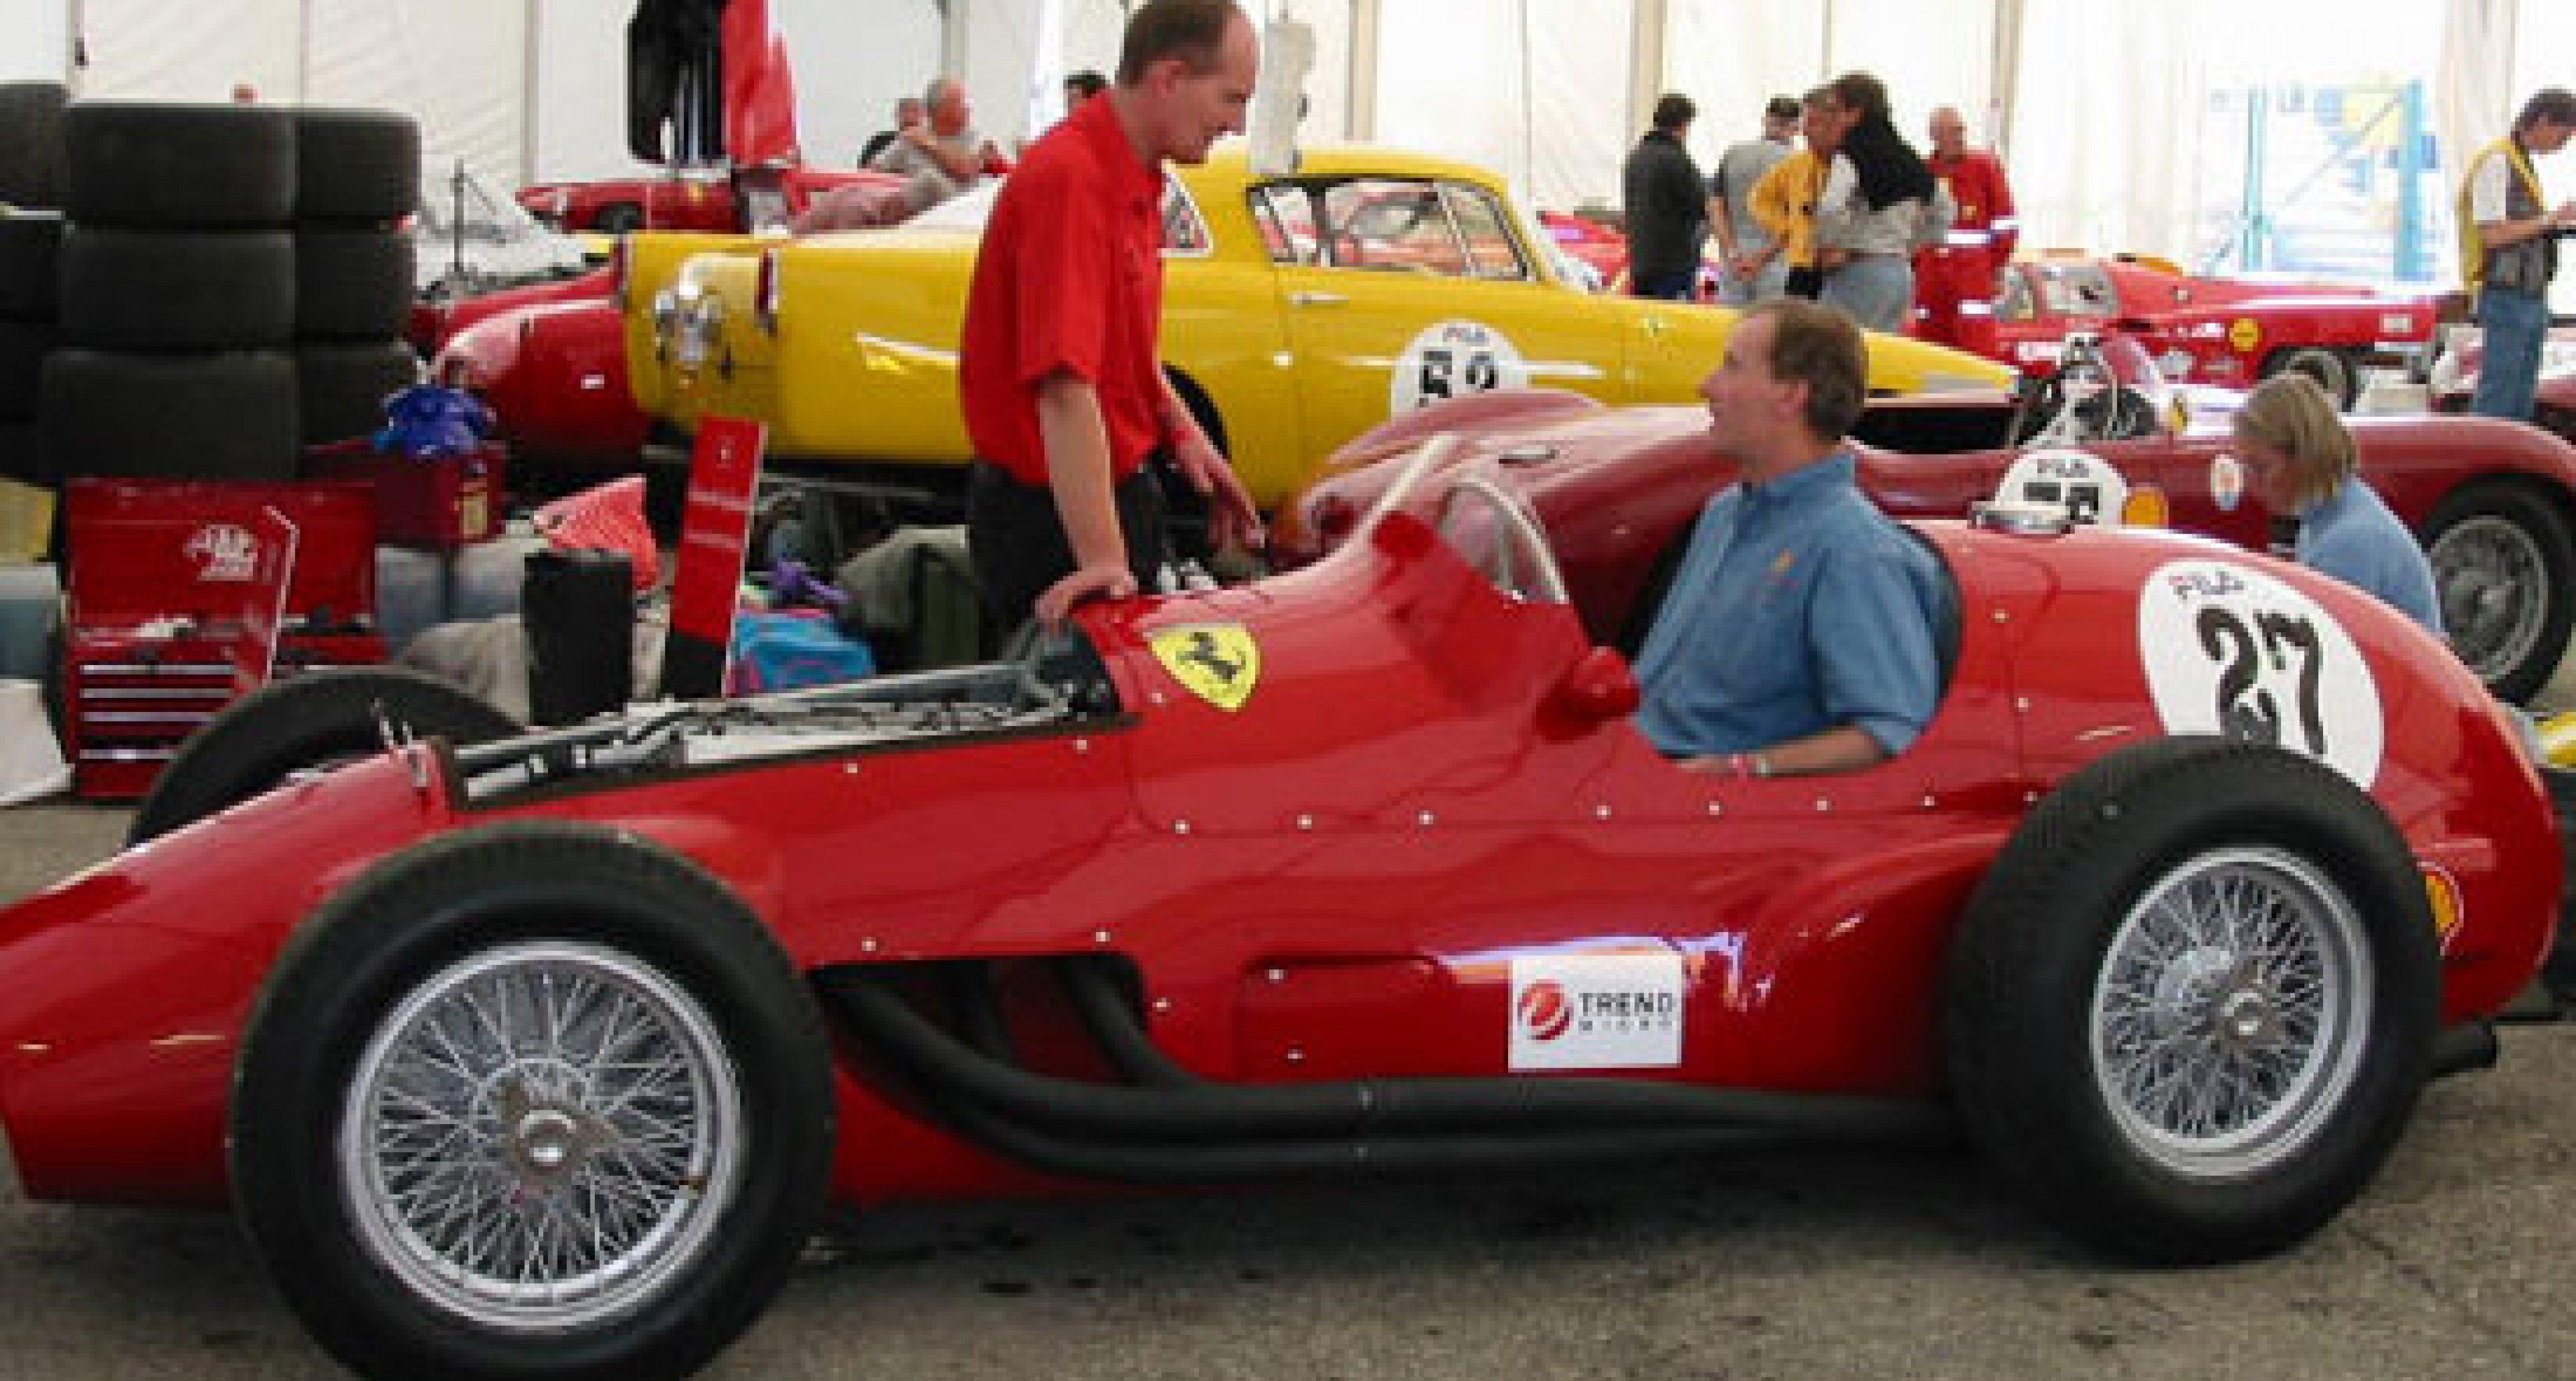 Ferrari at Misano 2002